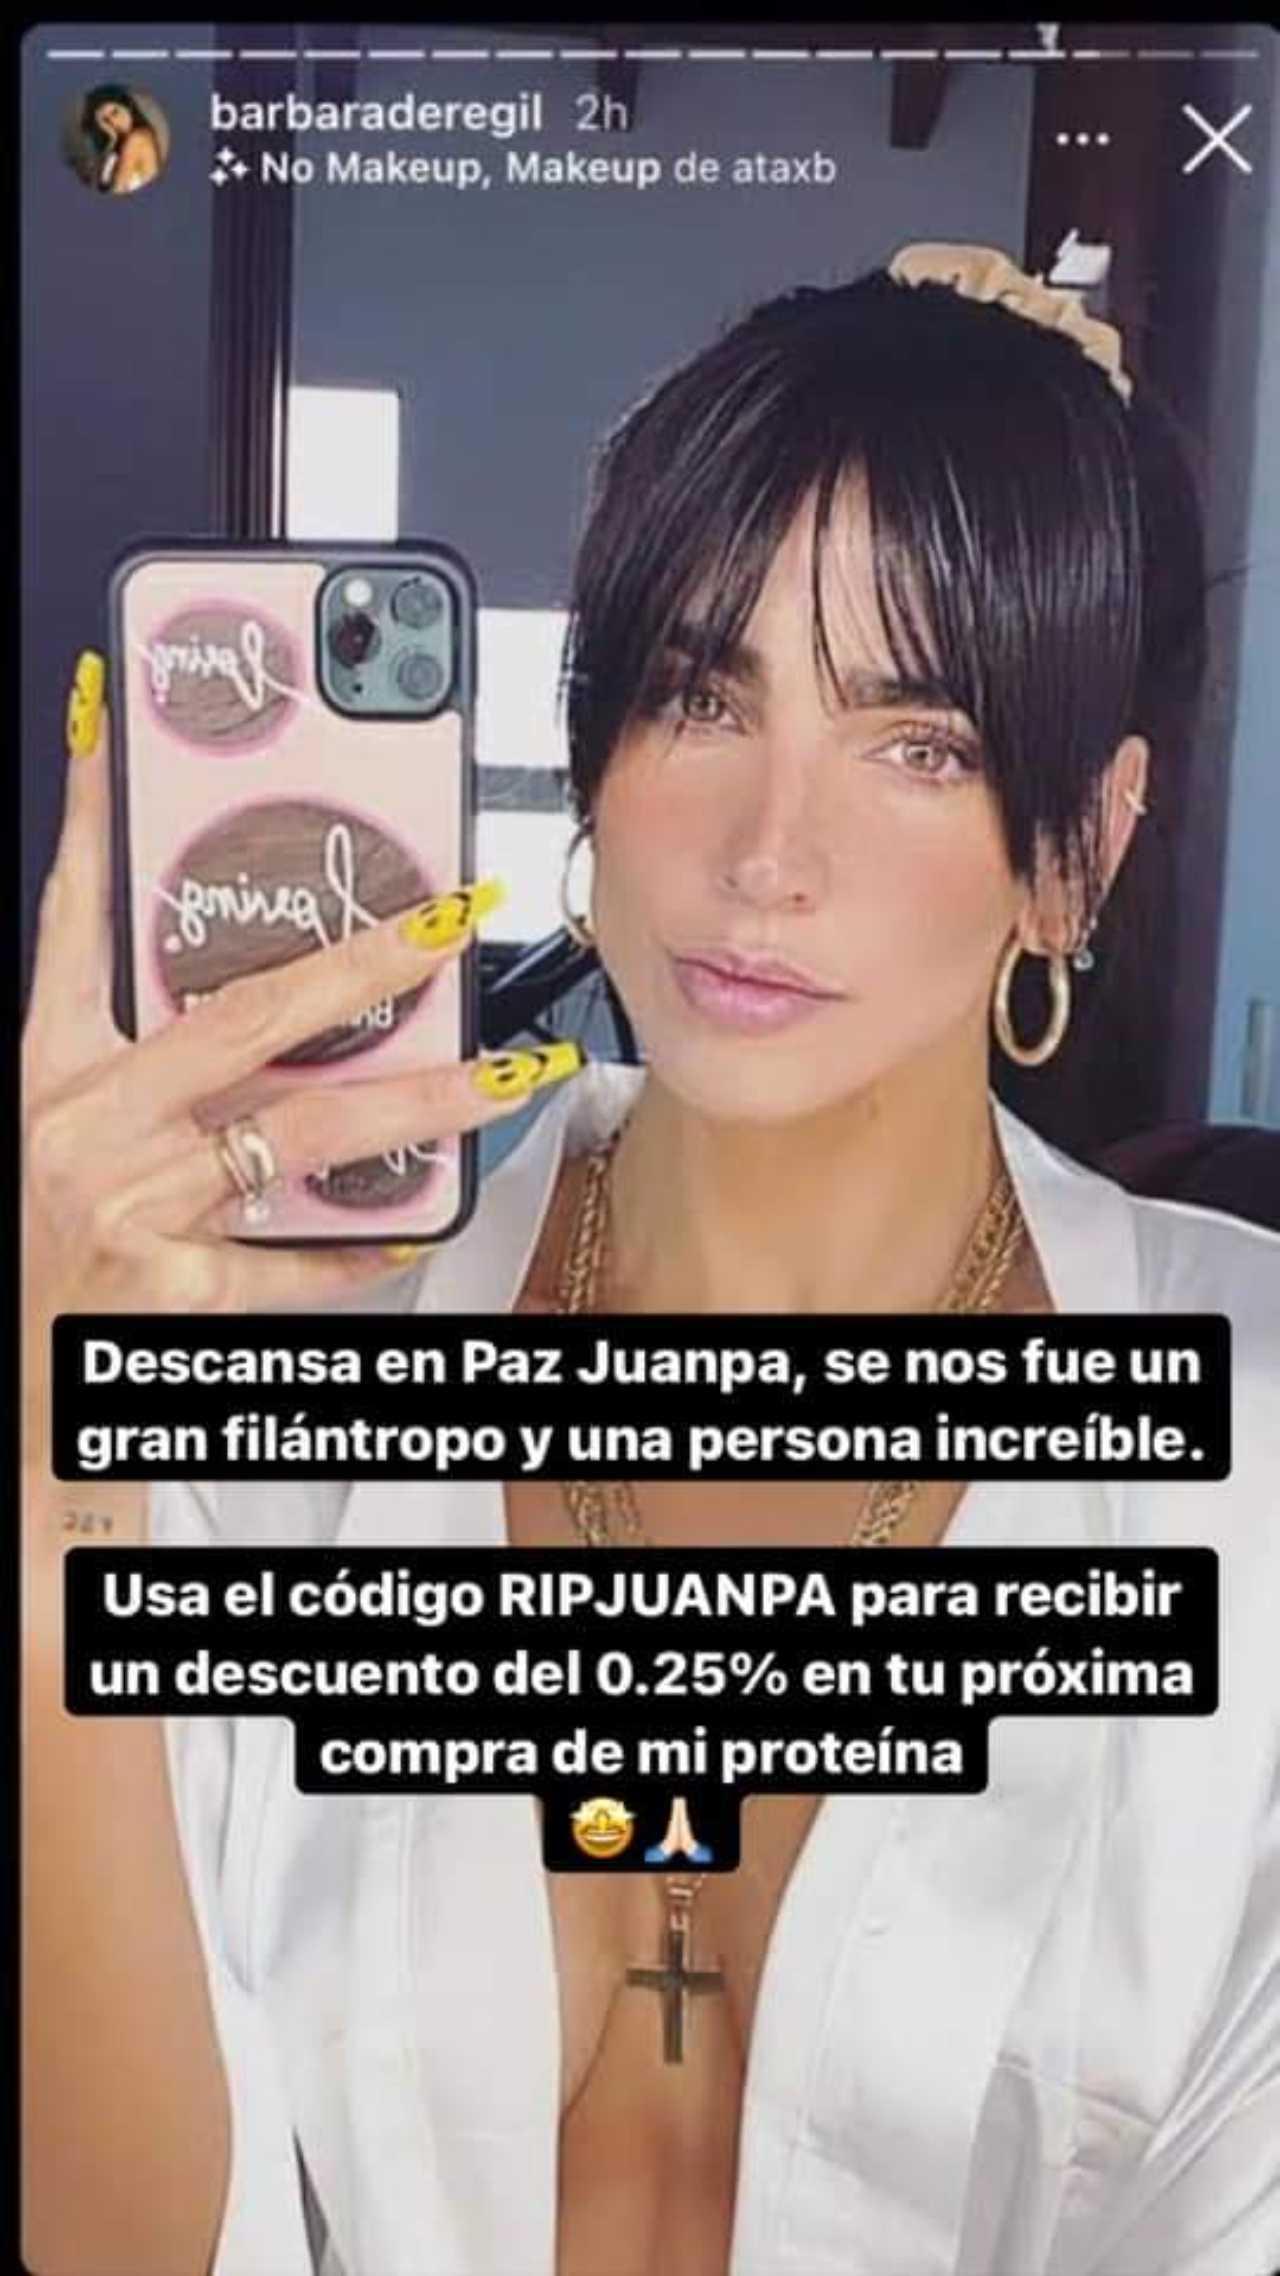 Meme de la muerte de Juanpa Zurita con Bárbara de Regil